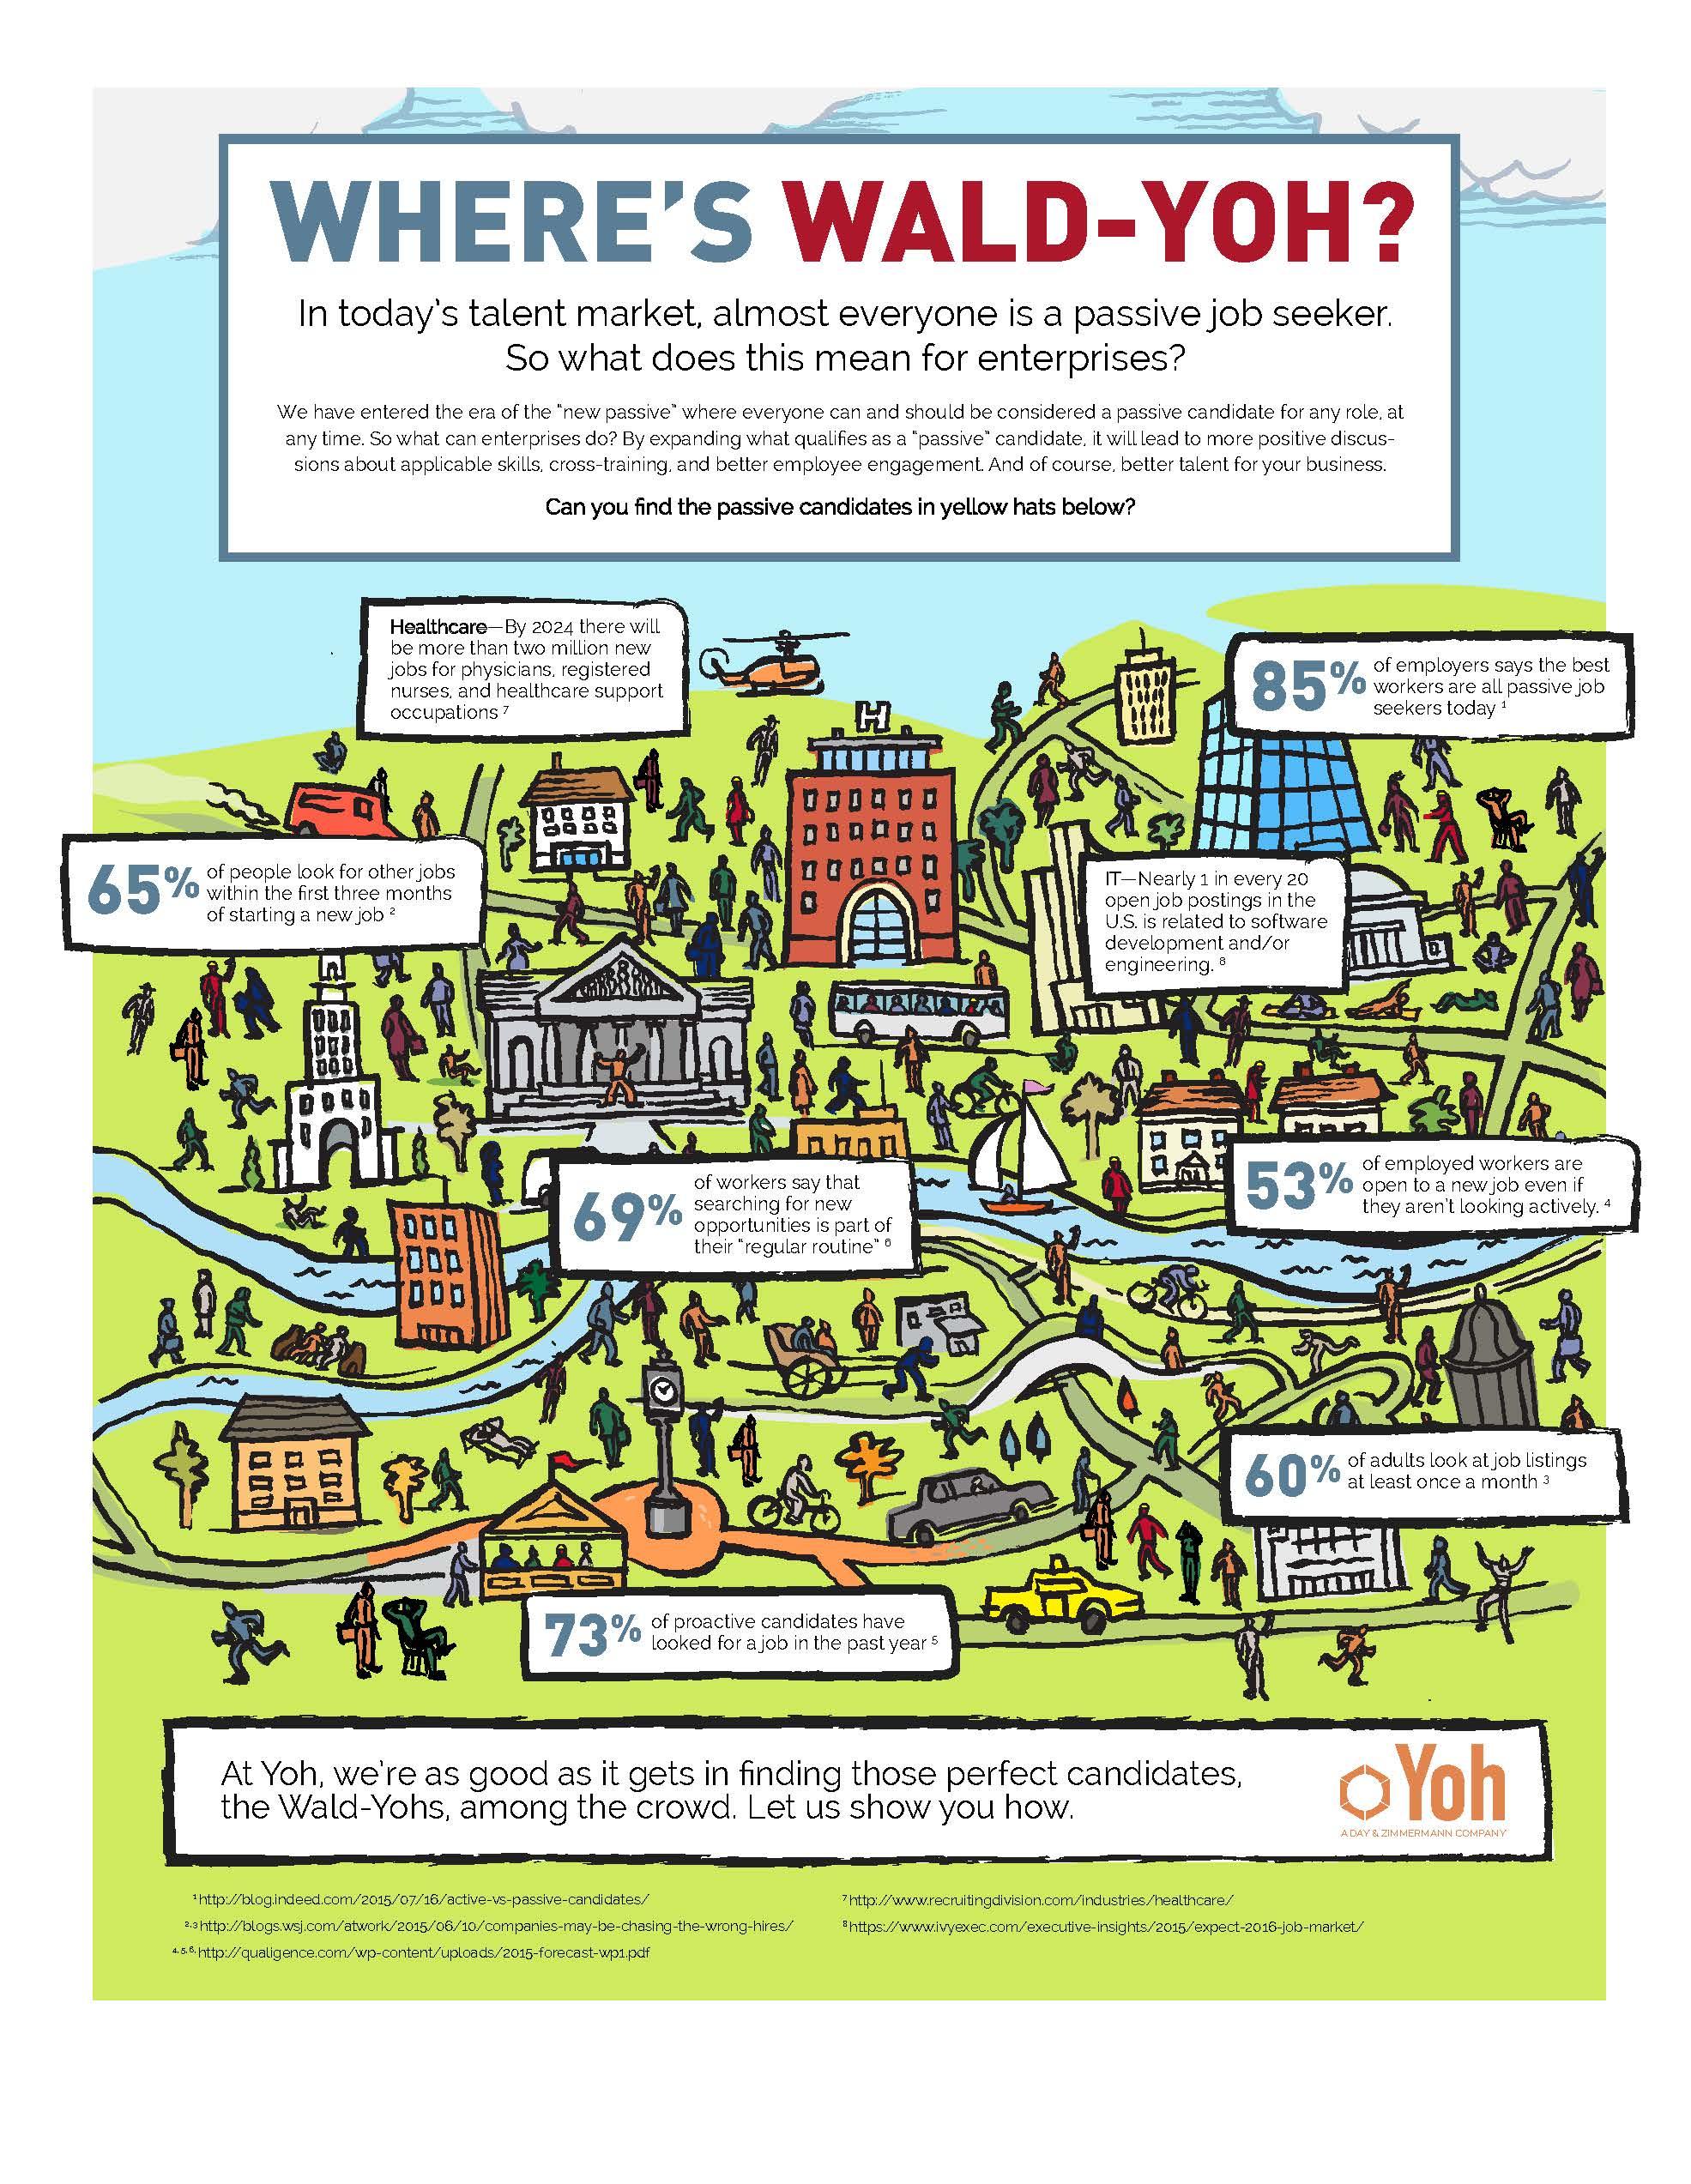 revision_wheres-wald-yoh-illustration1.jpg